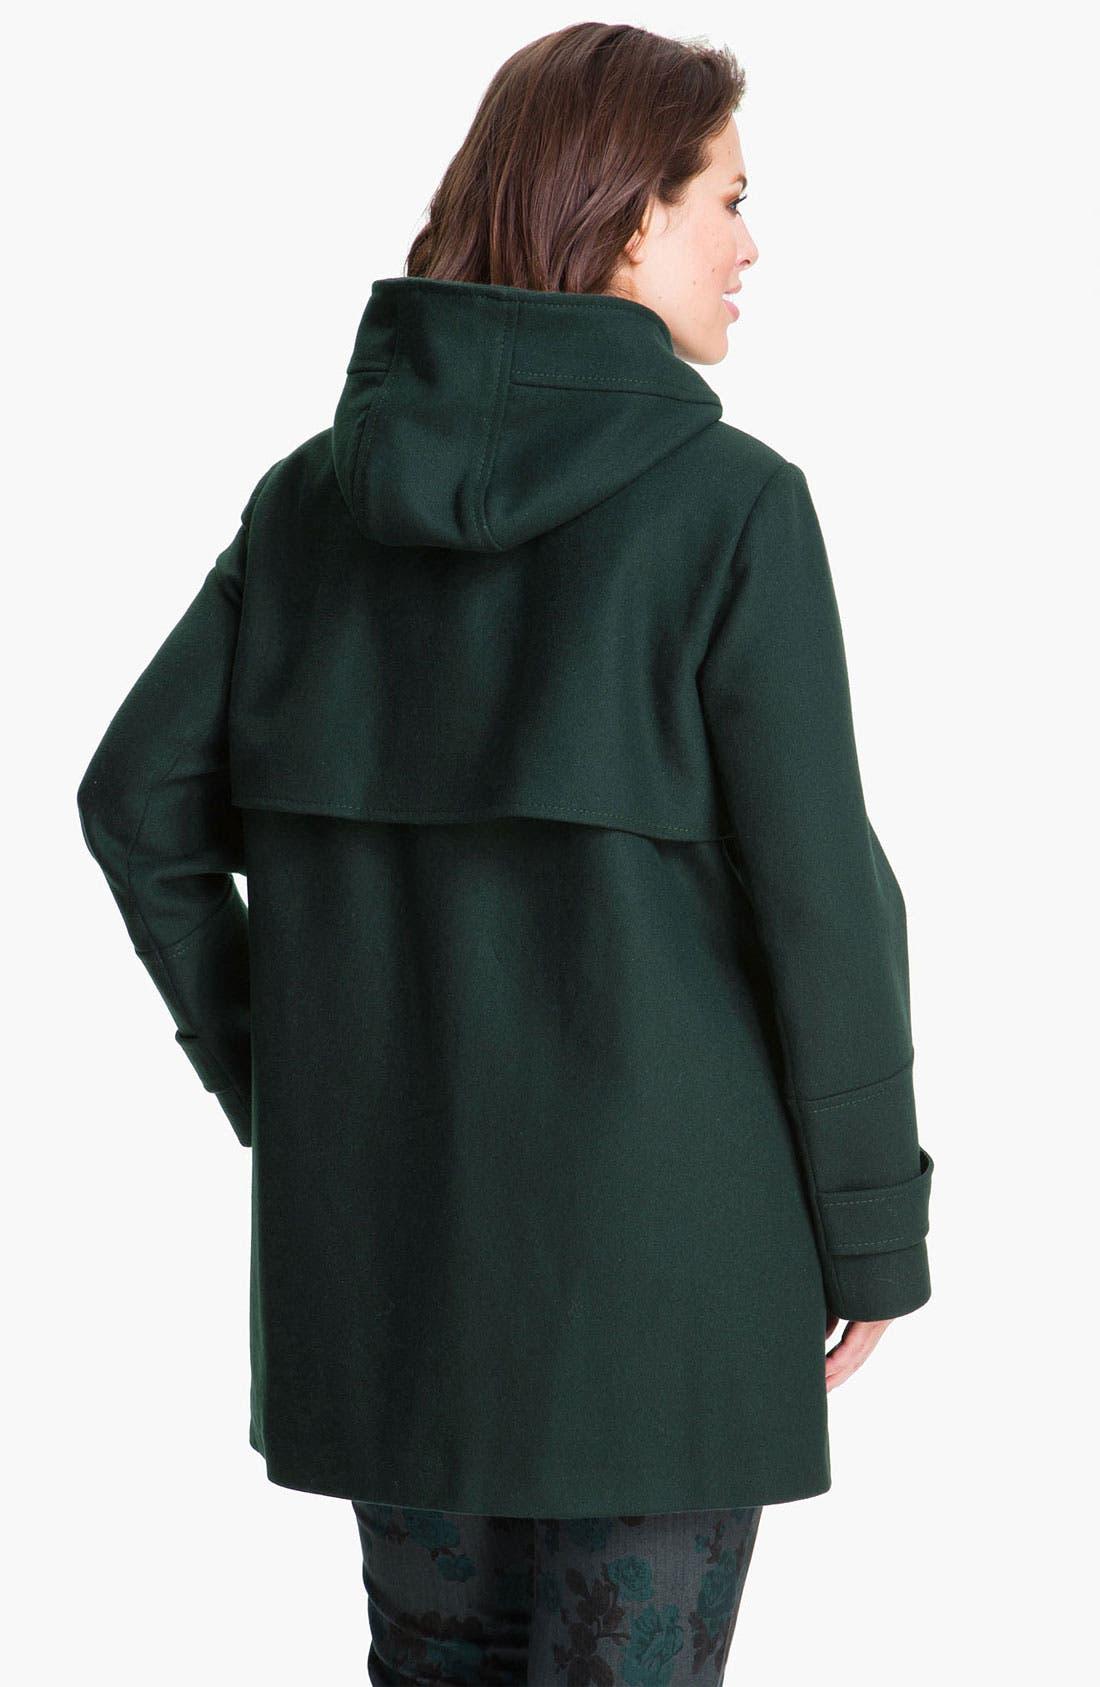 Alternate Image 2  - Vince Camuto Wool Blend Jacket with Detachable Hood (Plus)